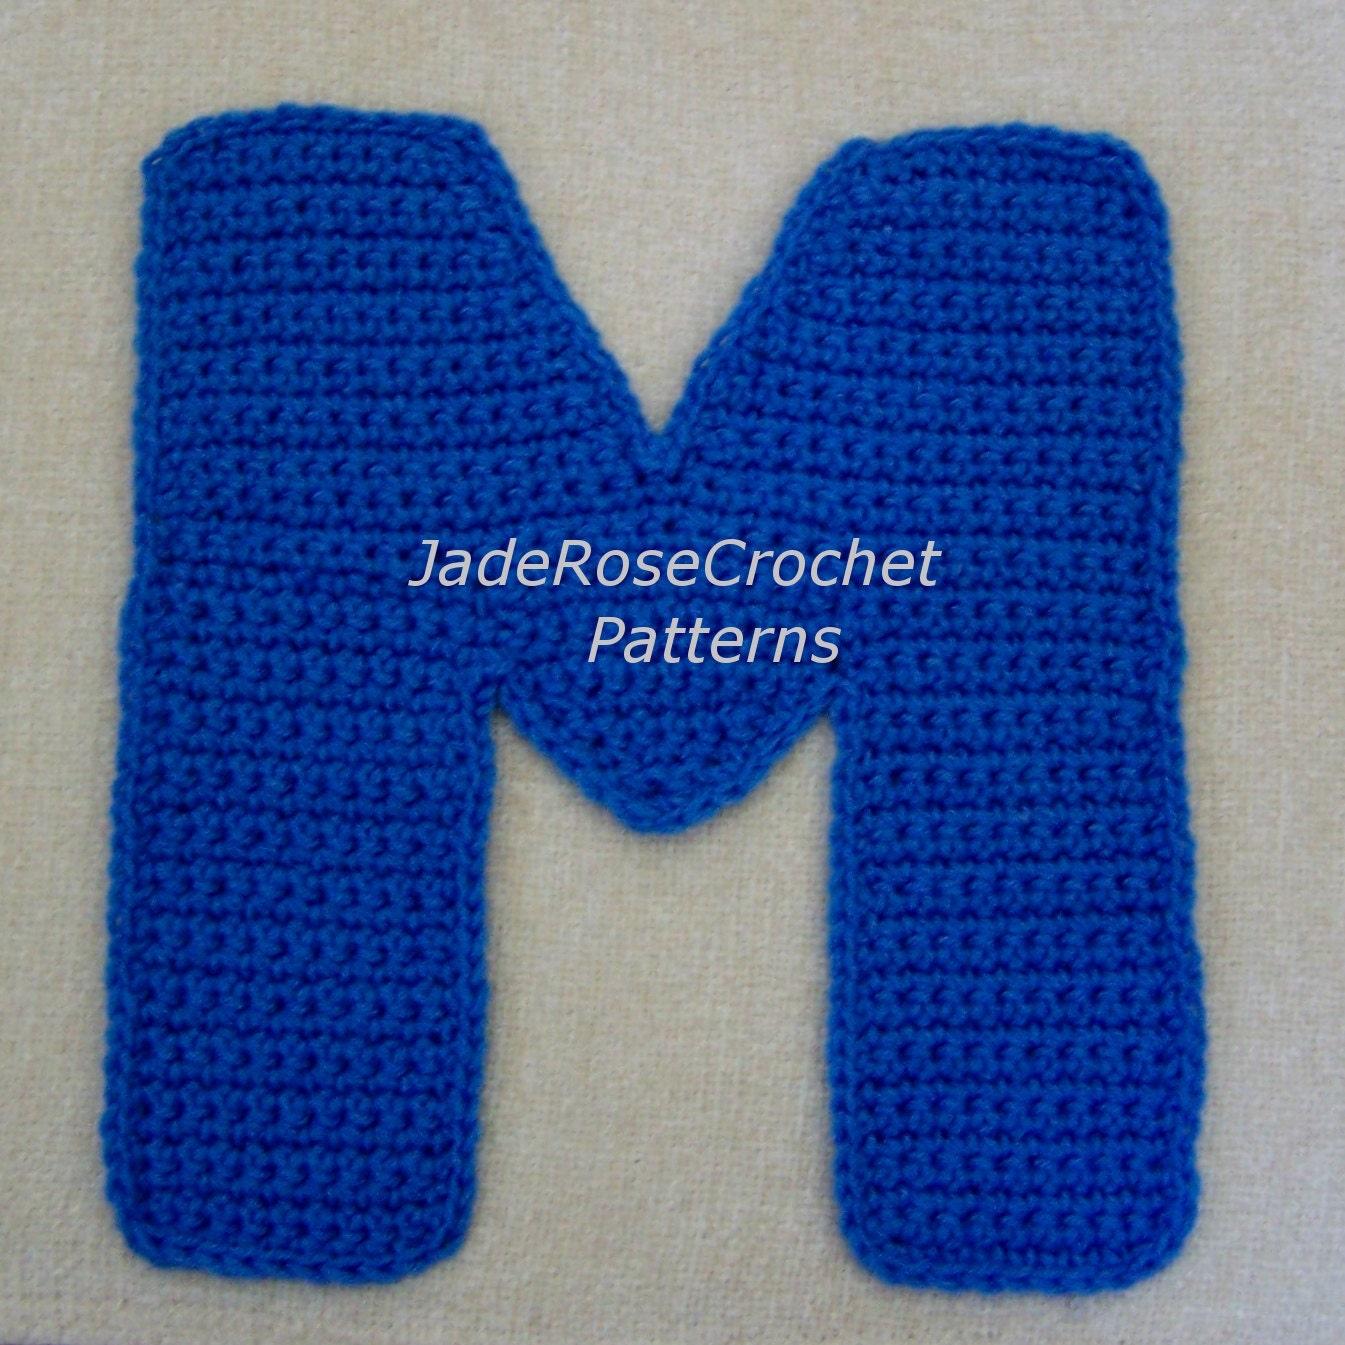 Crochet Letter Patterns M by JadeRoseCrochet on Etsy